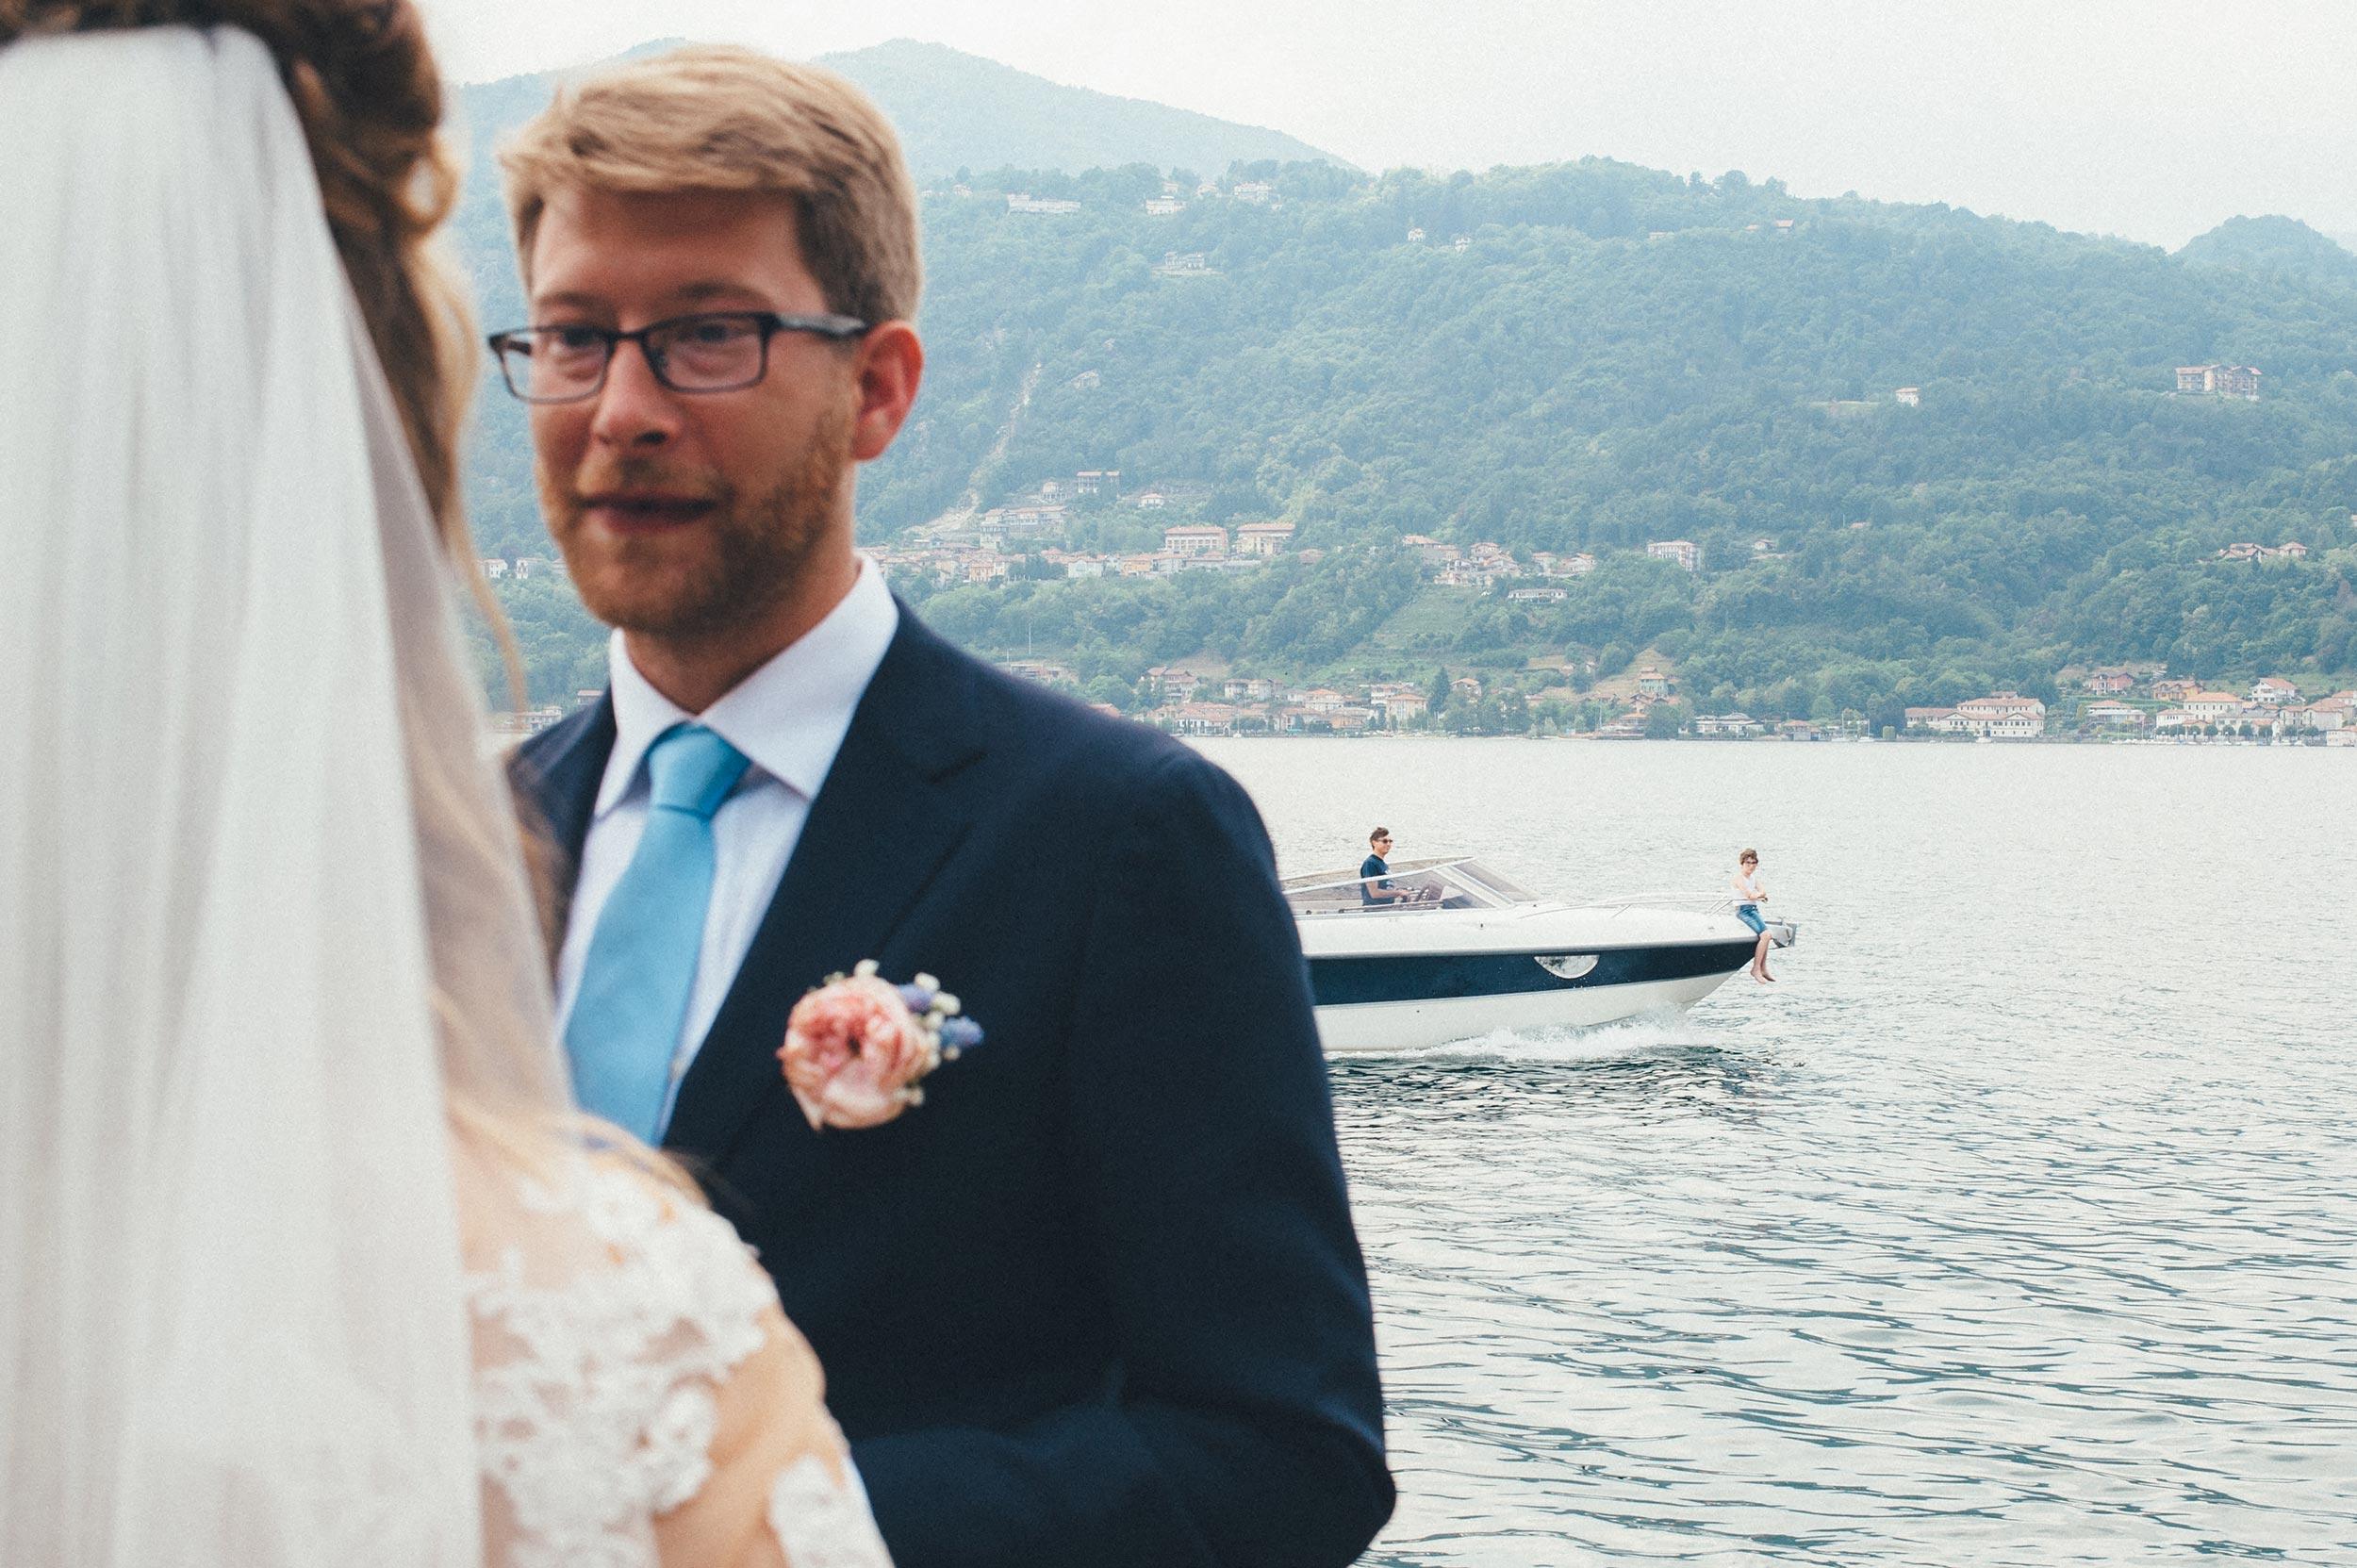 2016-Julius-Silke-Lake-Orta-Wedding-Photographer-Italy-Alessandro-Avenali-61.jpg